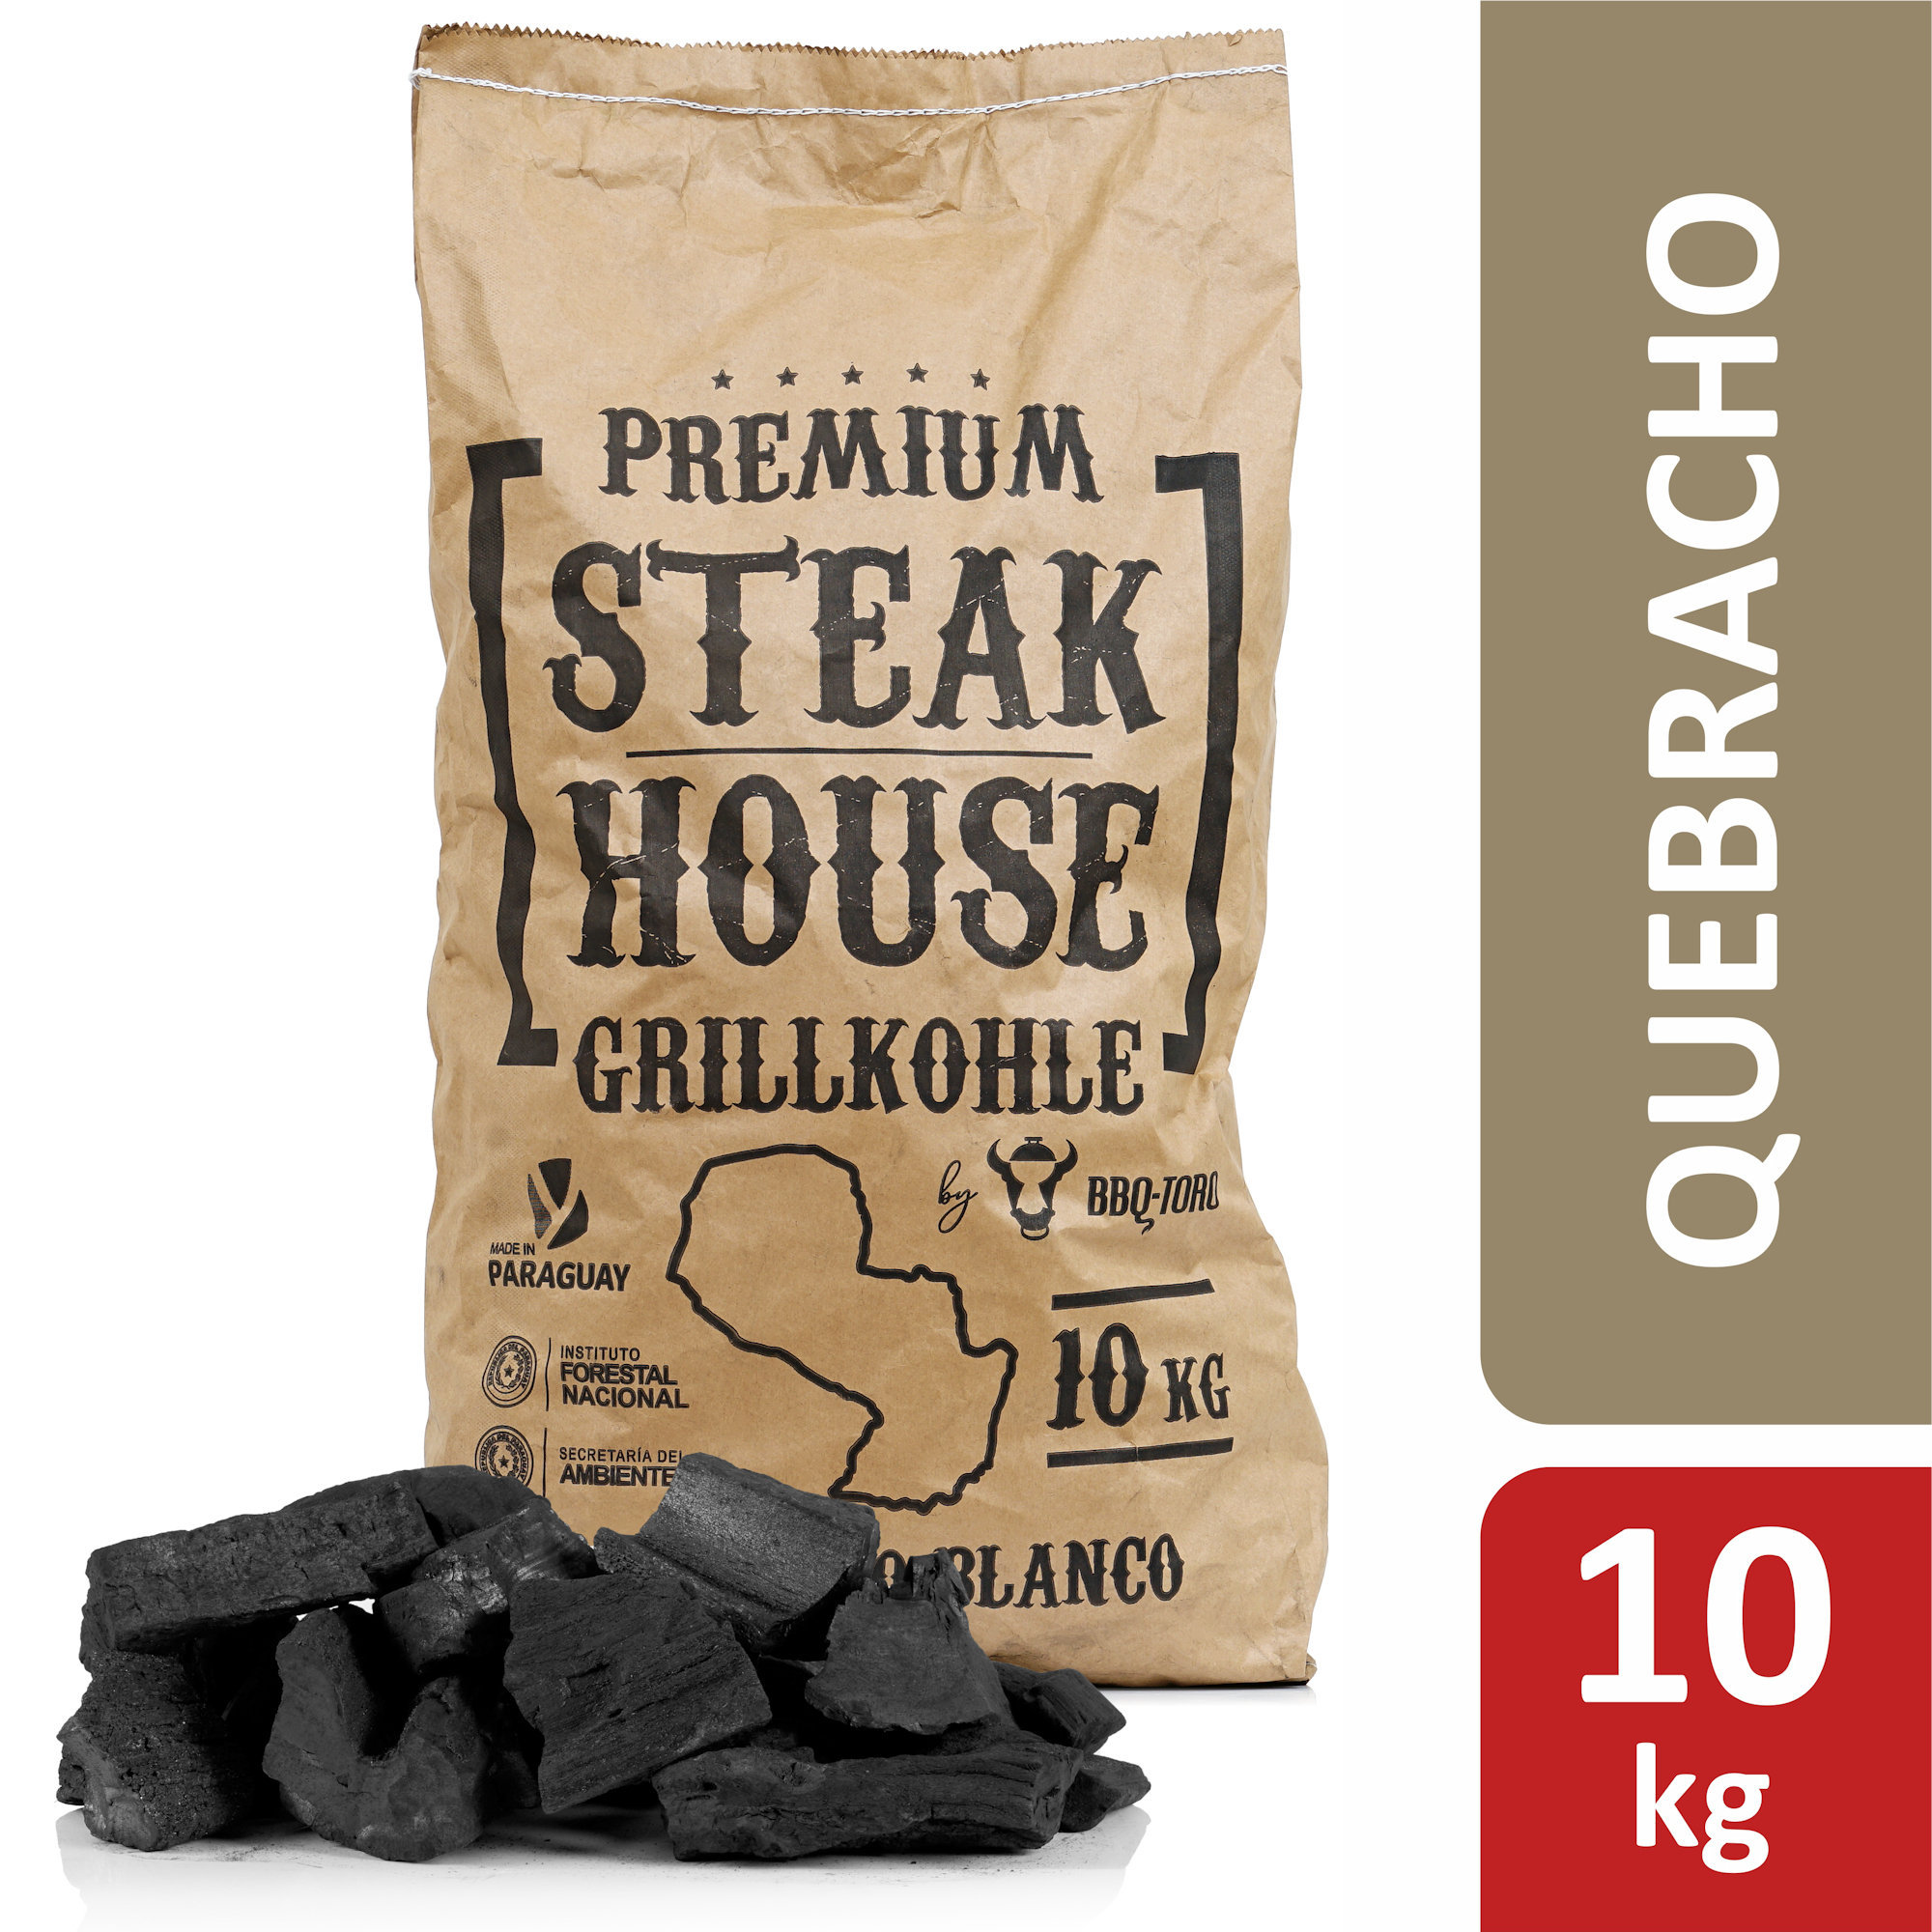 BBQ-Toro Premium Steak House Grillkohle20 kgQuerbracho Blanco Restaurant